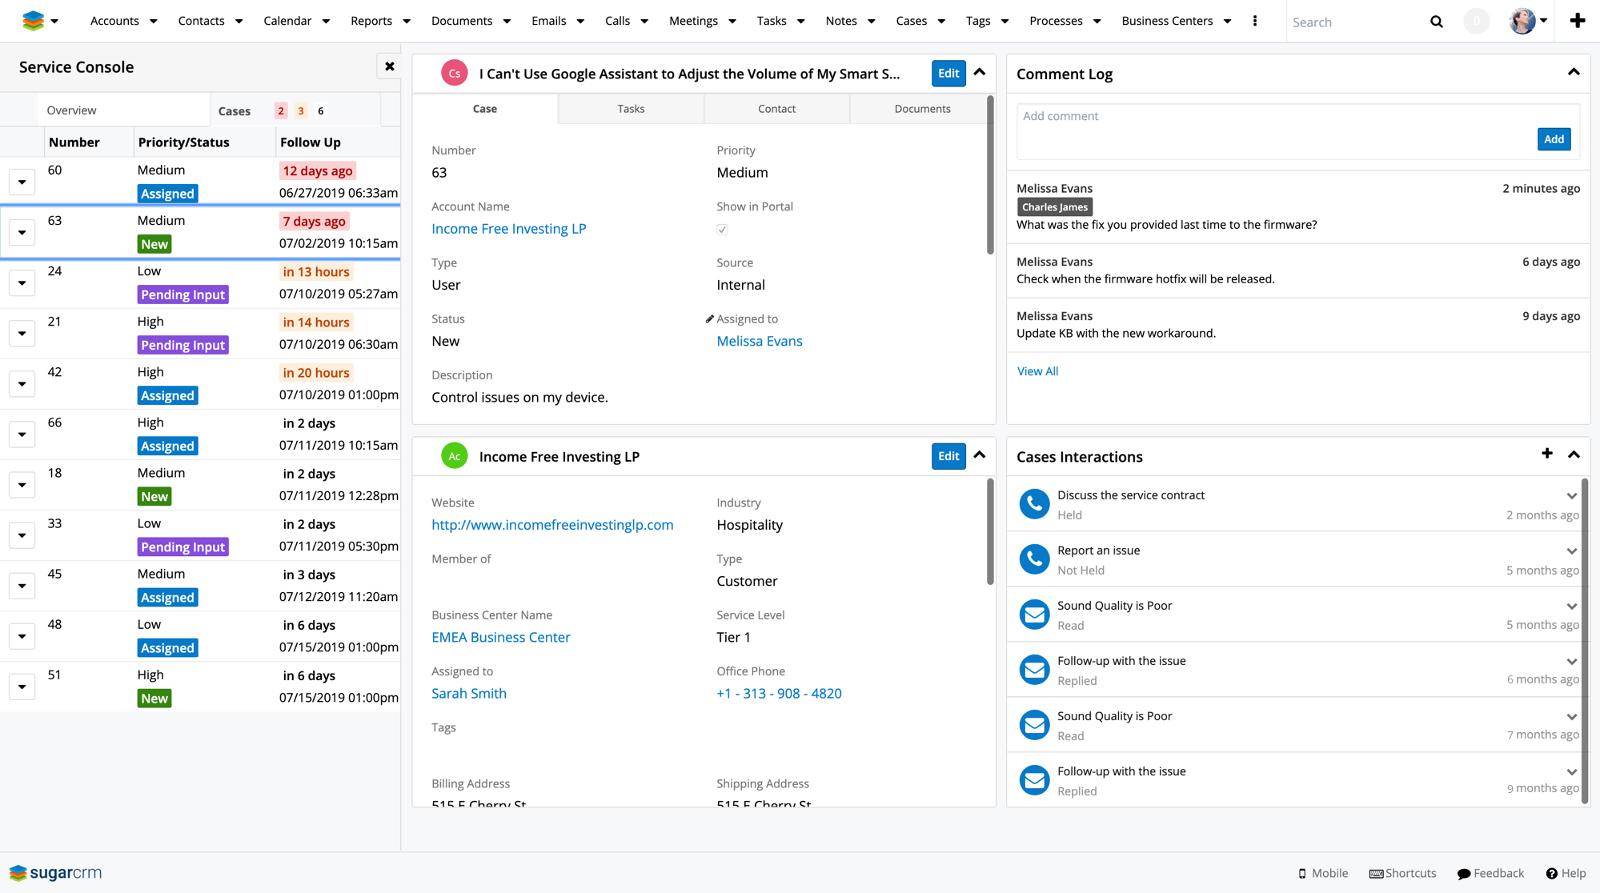 Screenshot of SugarCRM customer service tools